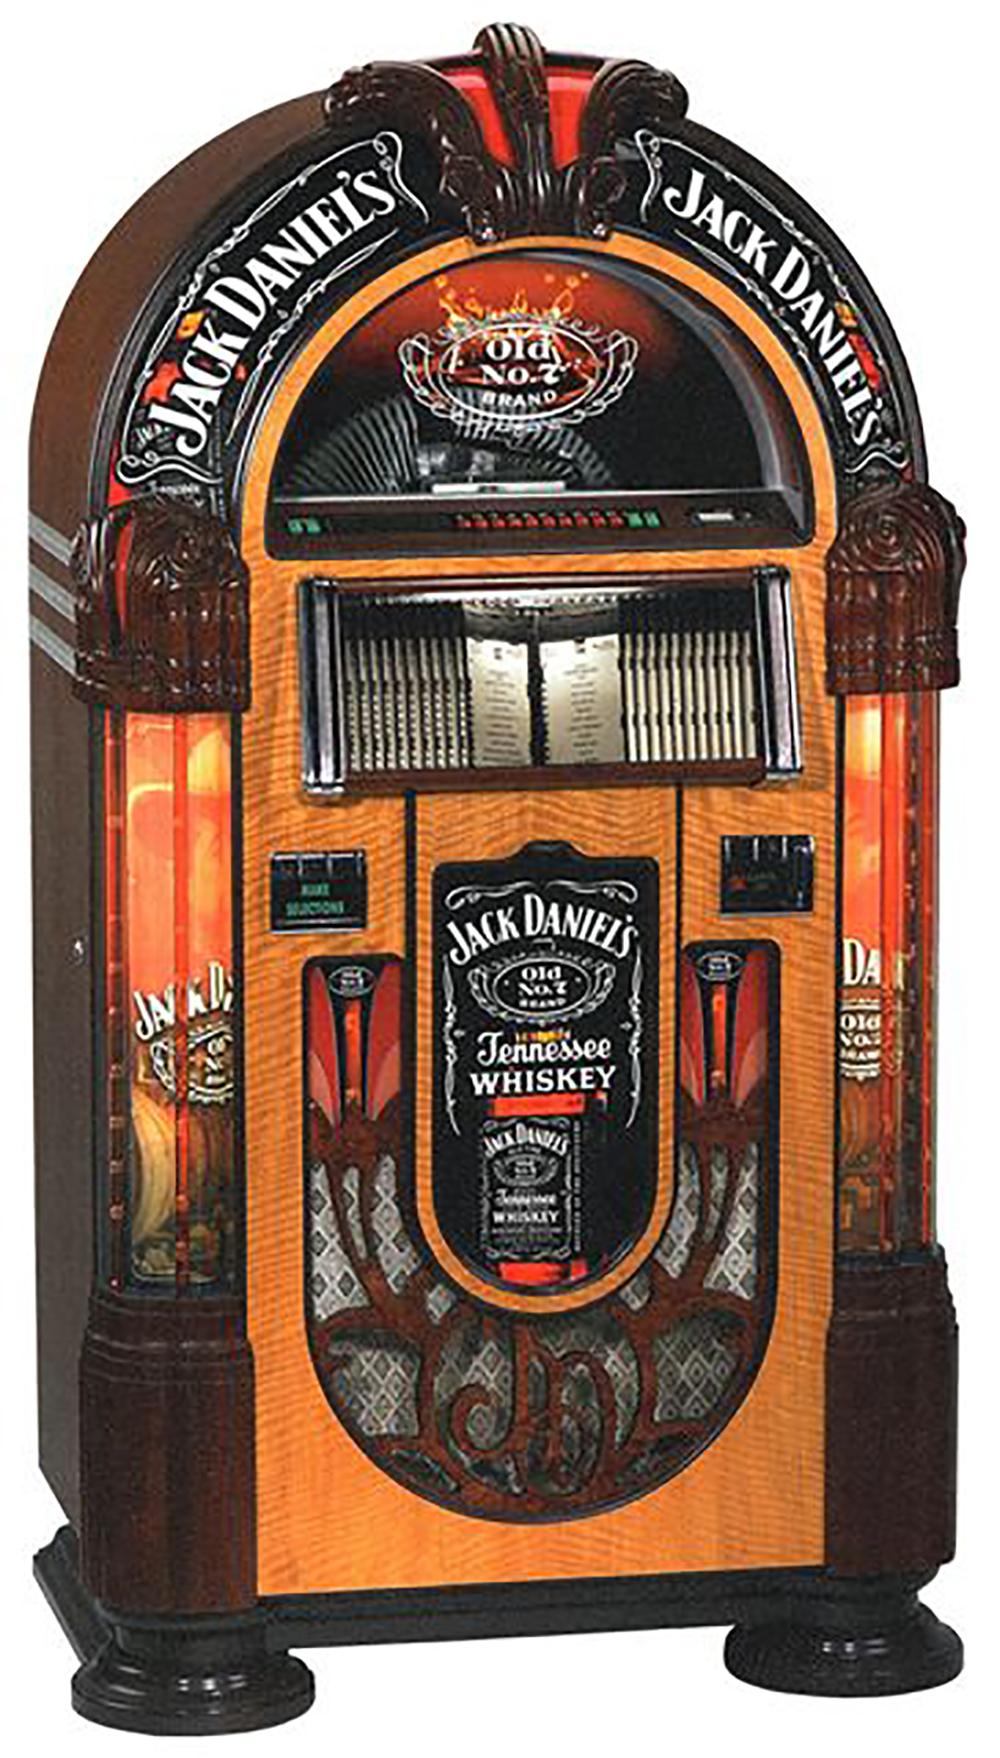 Rock Ola Gazelle Cd Bubbler Jukebox Game Room Guys